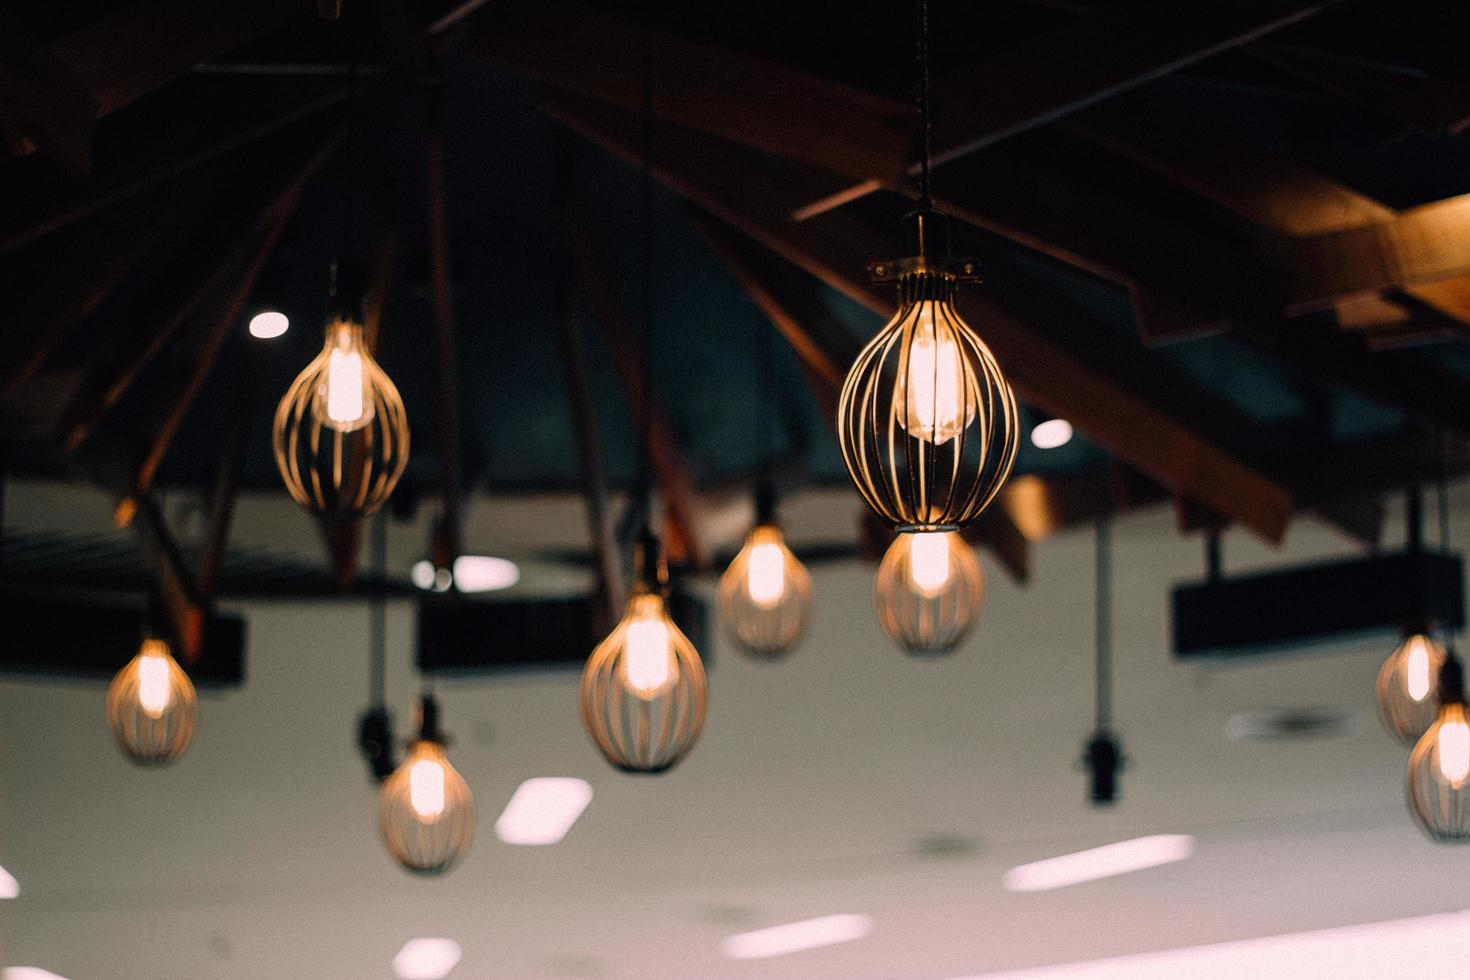 lampade a sospensione illuminate foto